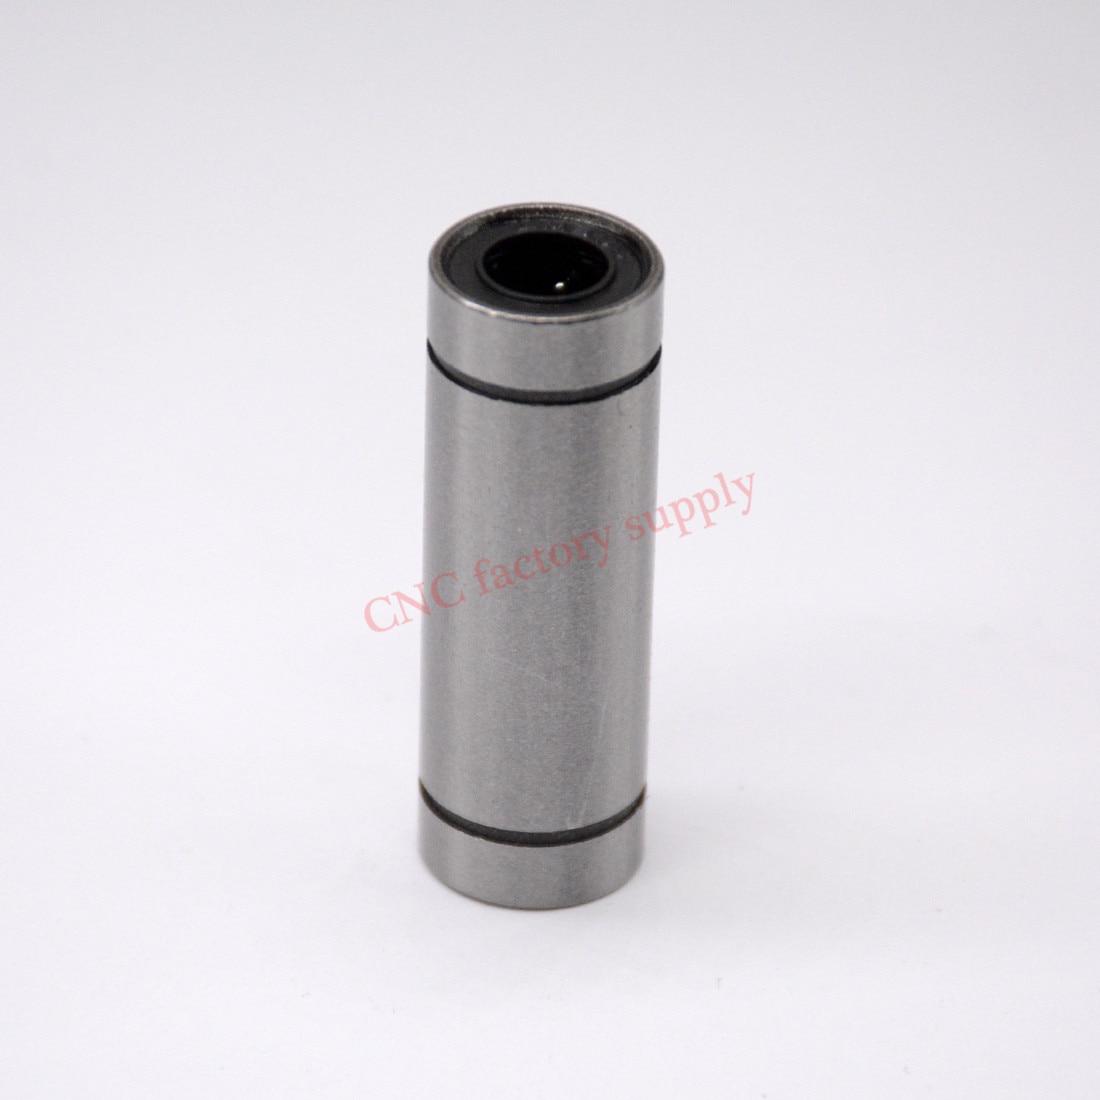 CNC factory supply 2pcs/lot Free Shipping LM12LUU long type 12mm linear ball bearing CNC parts for 3D printer